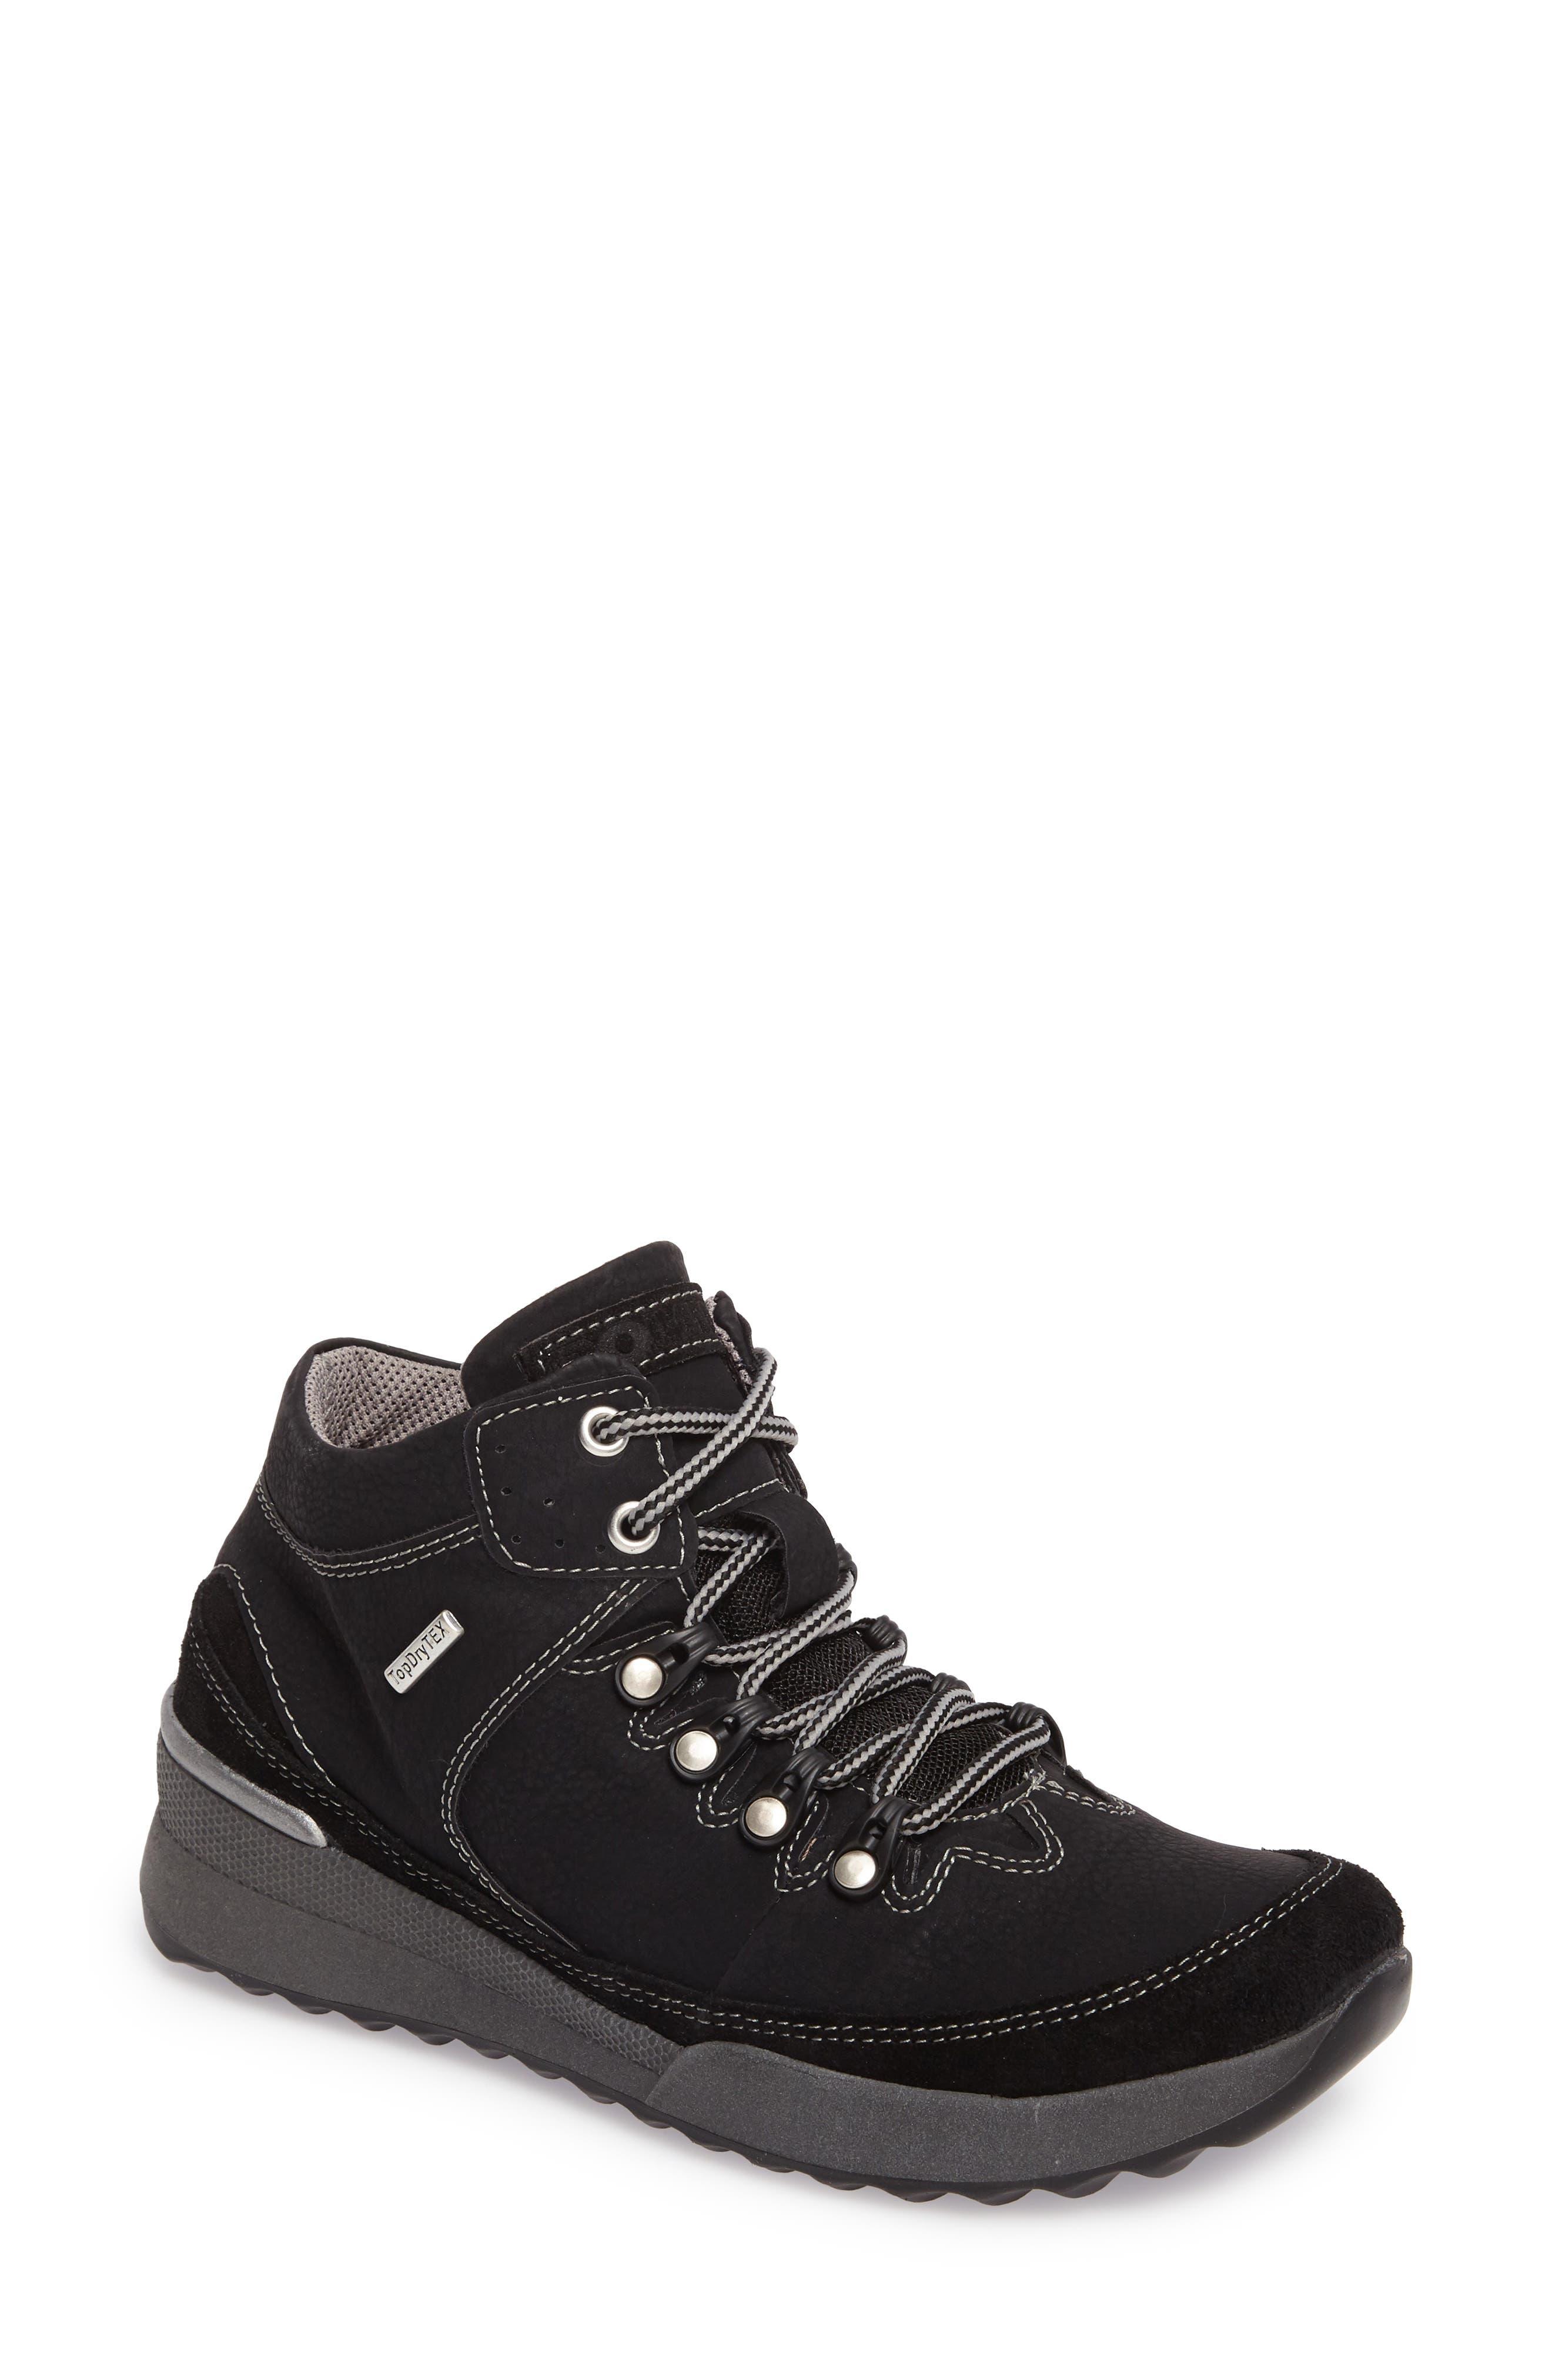 Victoria 05 Waterproof Sneaker,                             Main thumbnail 1, color,                             BLACK/ KOMBI LEATHER